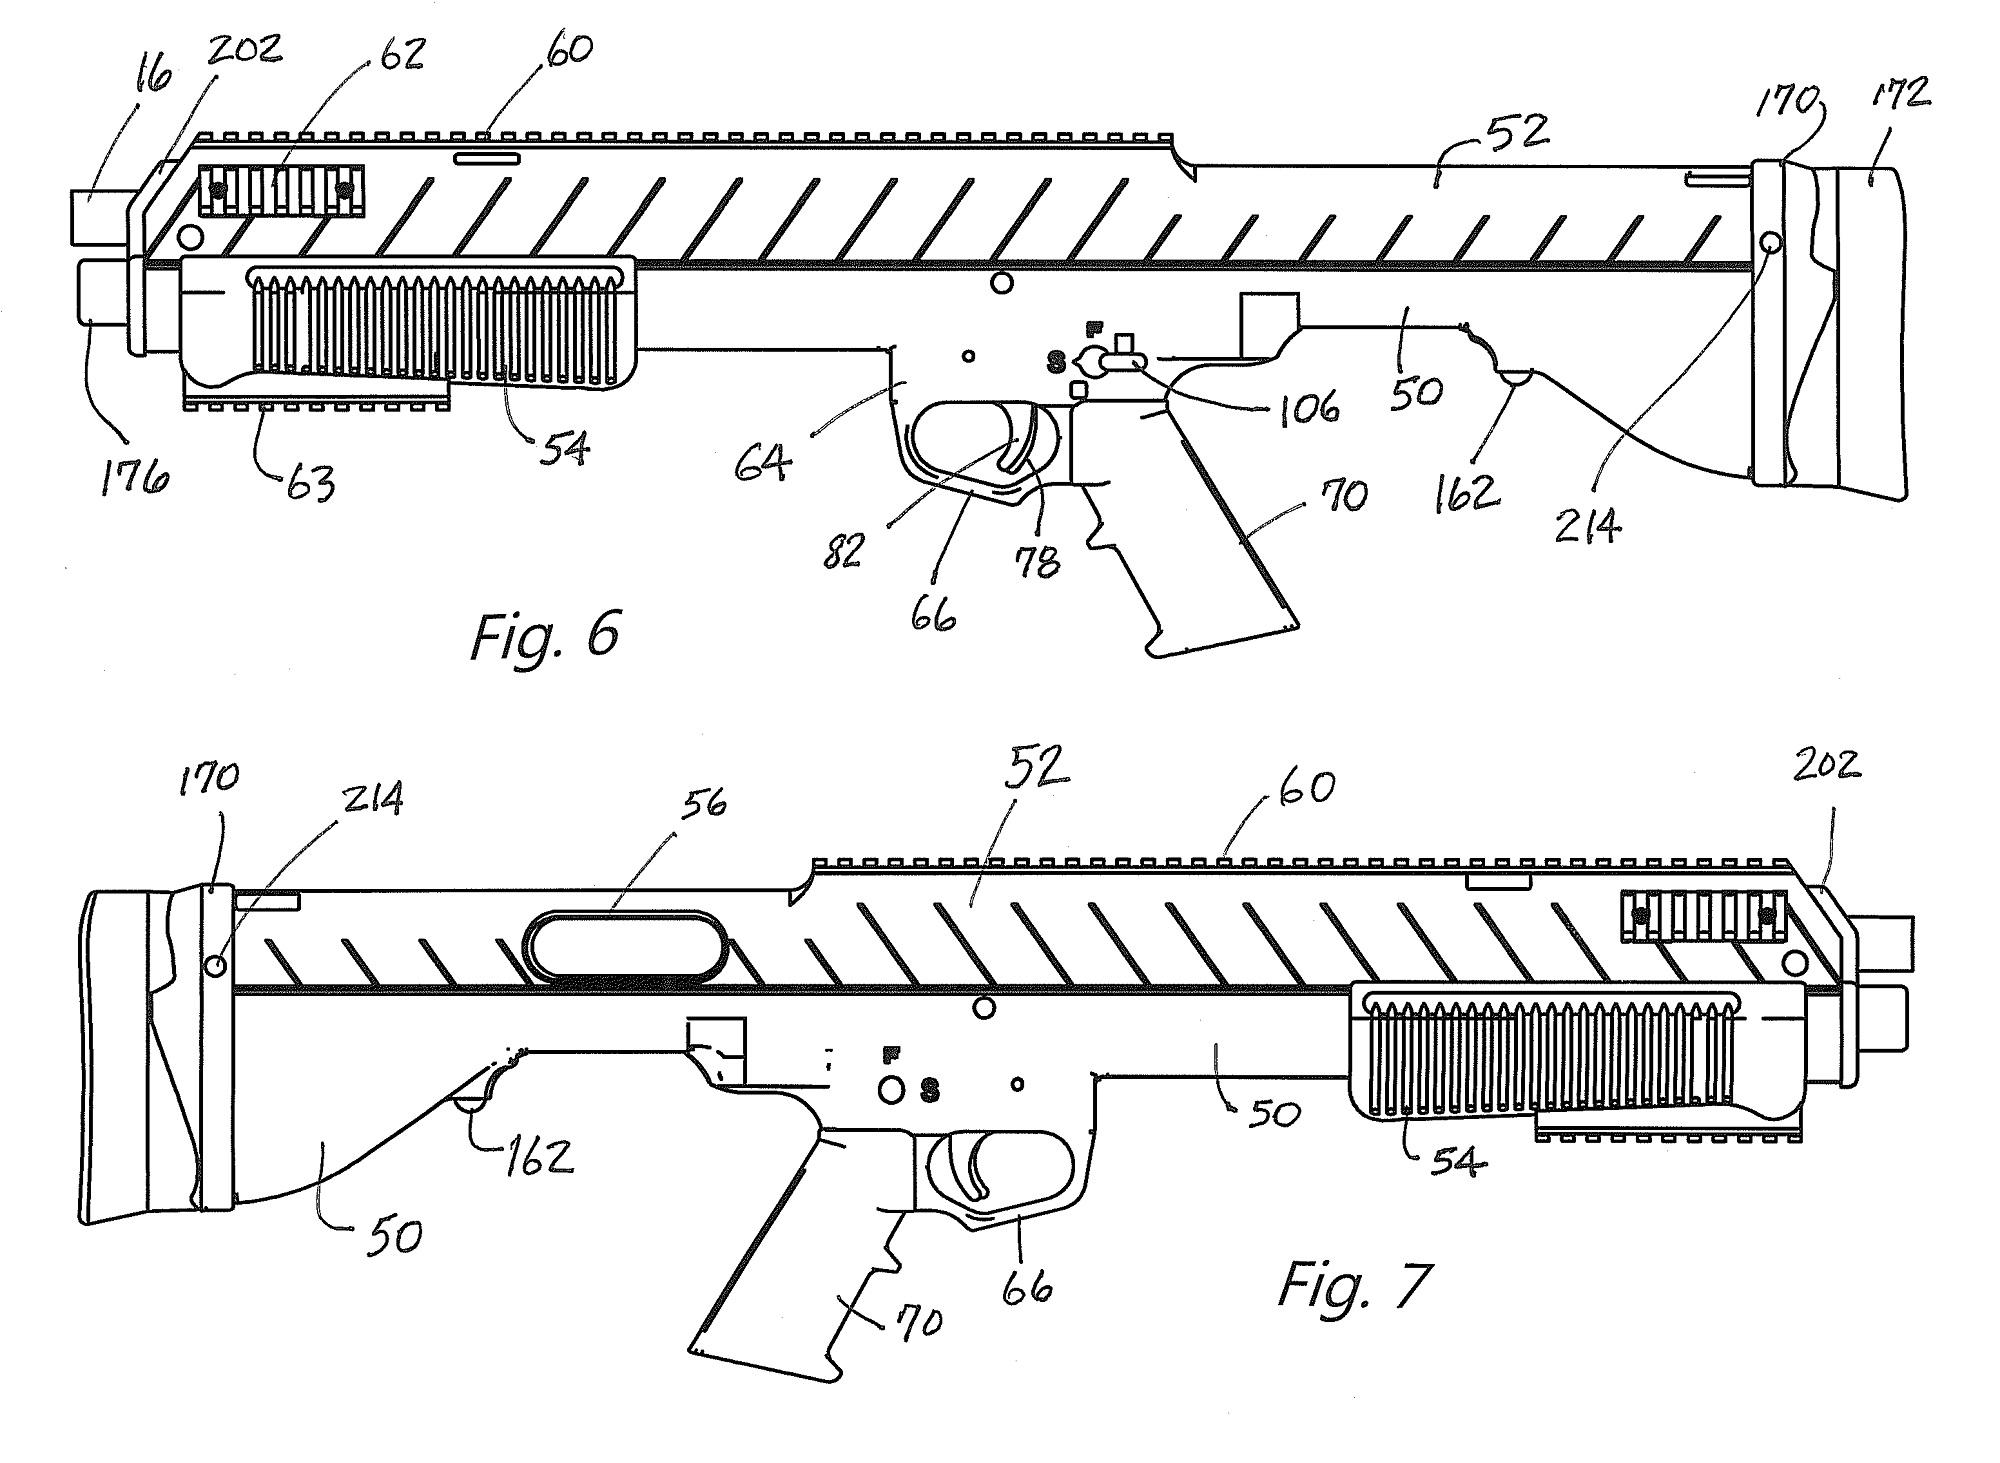 12 gauge bullpup bpu 870 conversion unit by bullpup unlimited rh all4shooters com remington 870 wingmaster diagram remington 870 diagram pdf